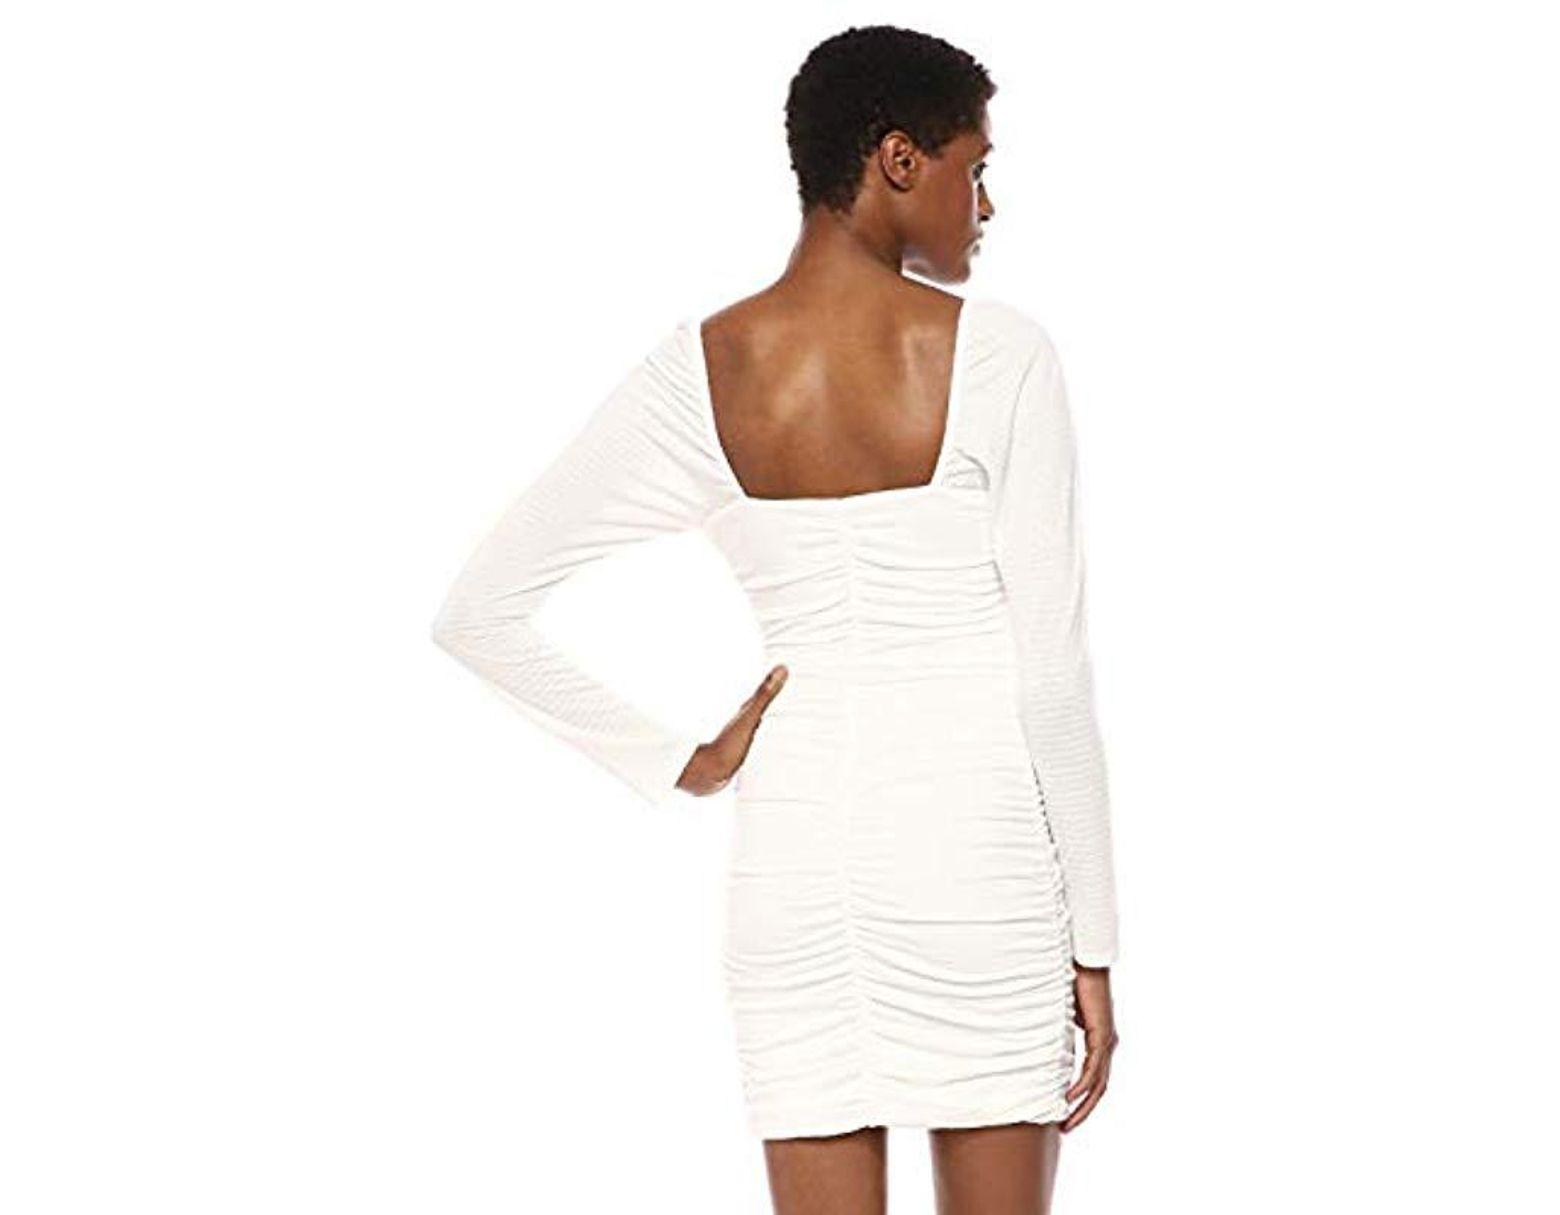 93aba33c5ac6 Ali & Jay Snapdraggon Long Sleeve Bodycon Ruched Short Mini Dress in White  - Lyst